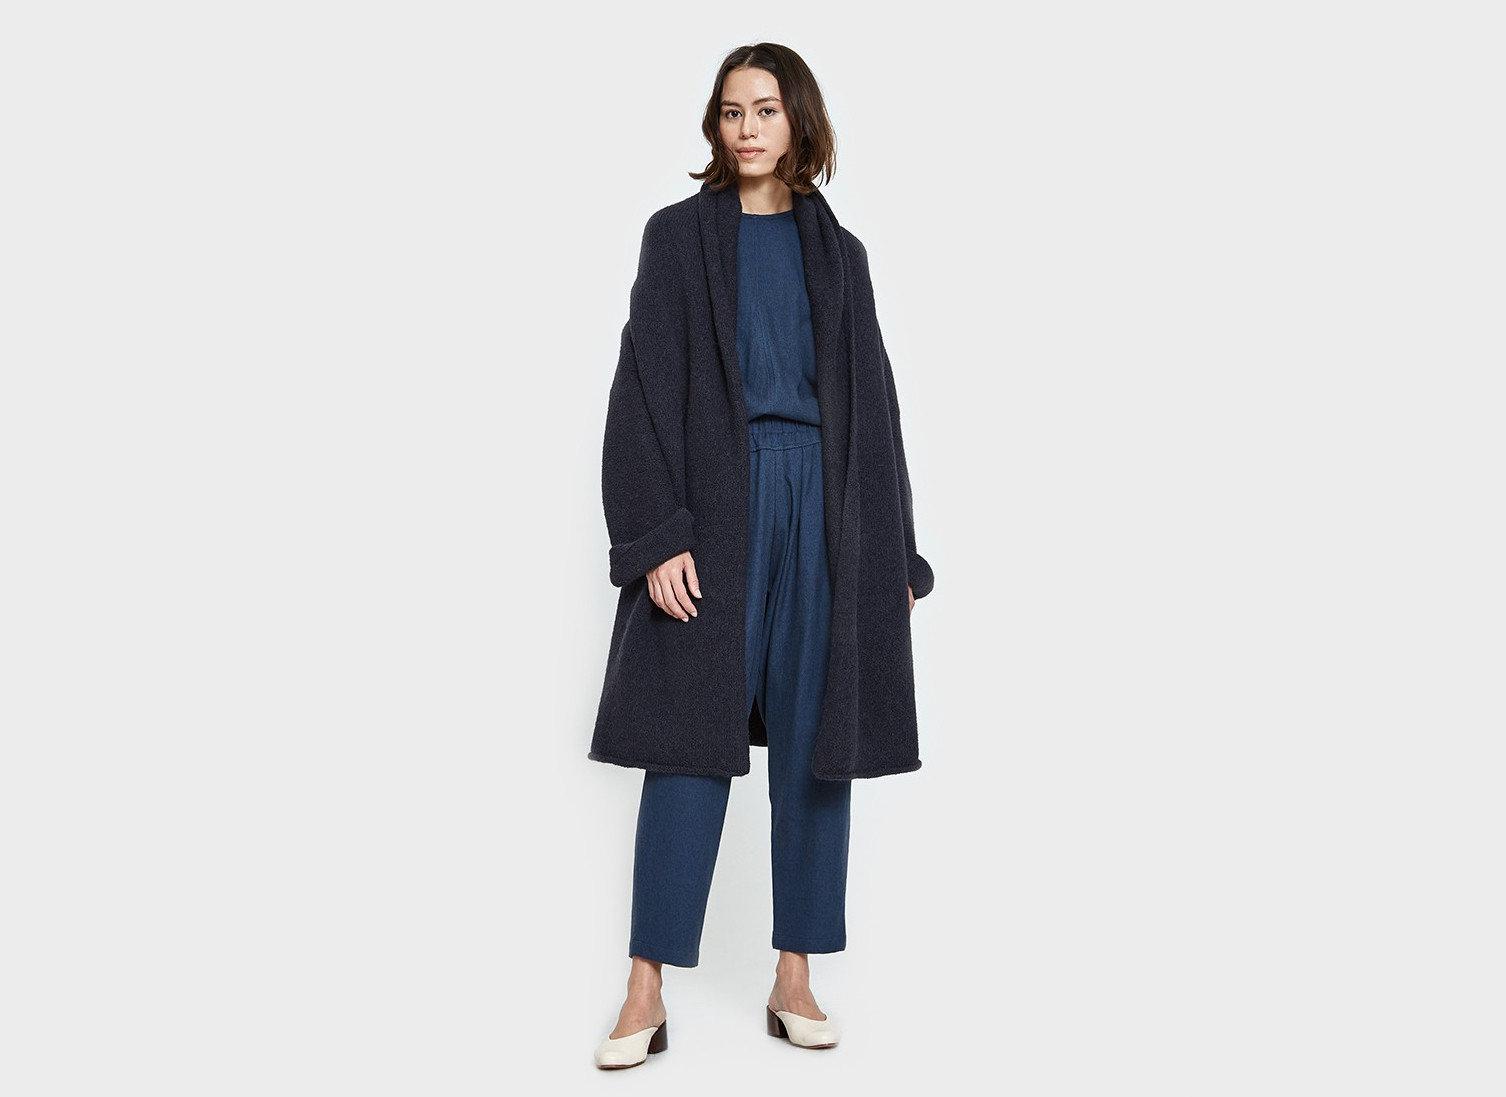 Style + Design Travel Shop coat clothing overcoat fashion model electric blue suit